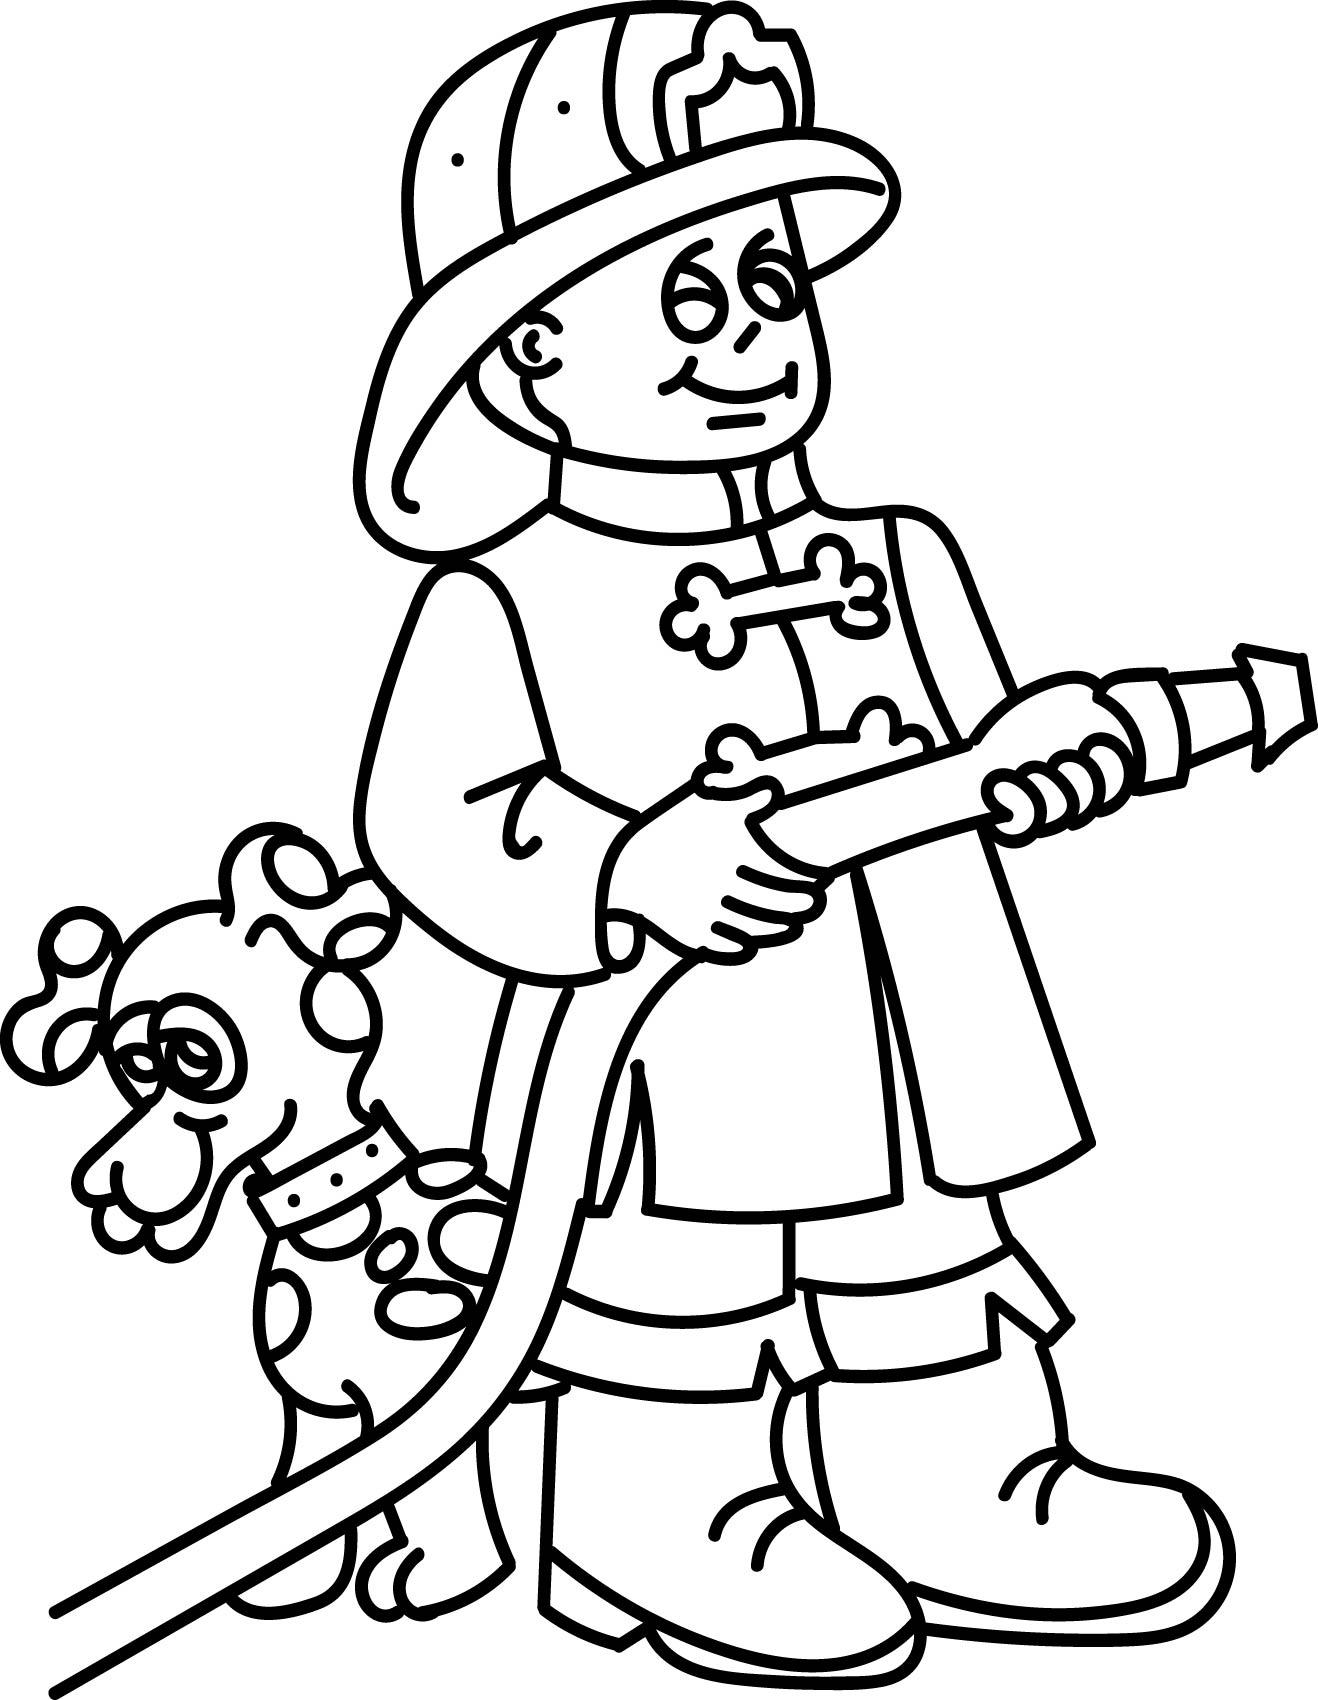 Fireman And Dog Coloring Page